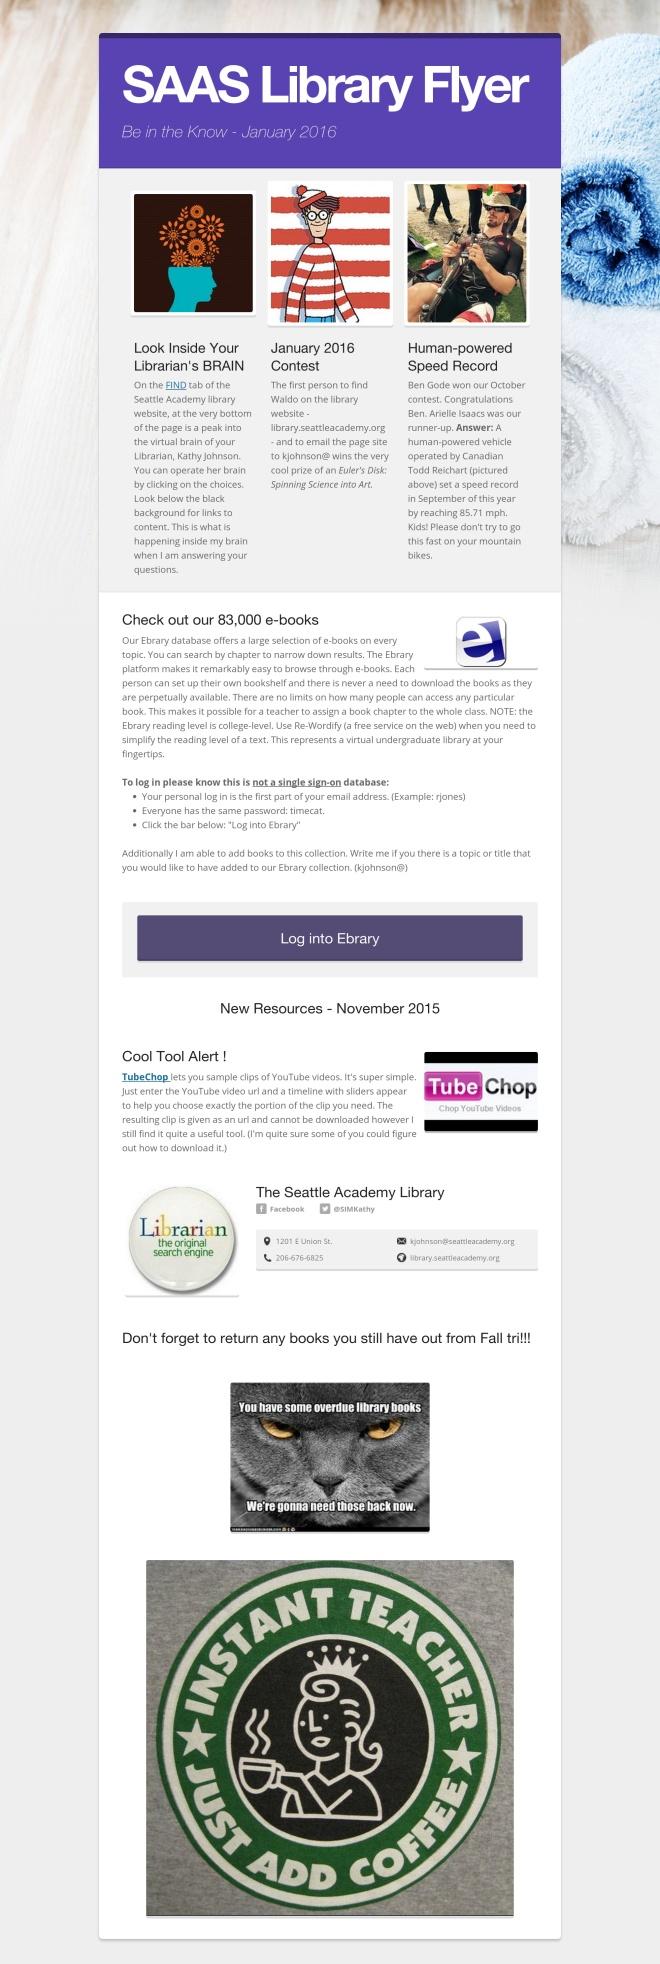 Library Flyer Jan 2016